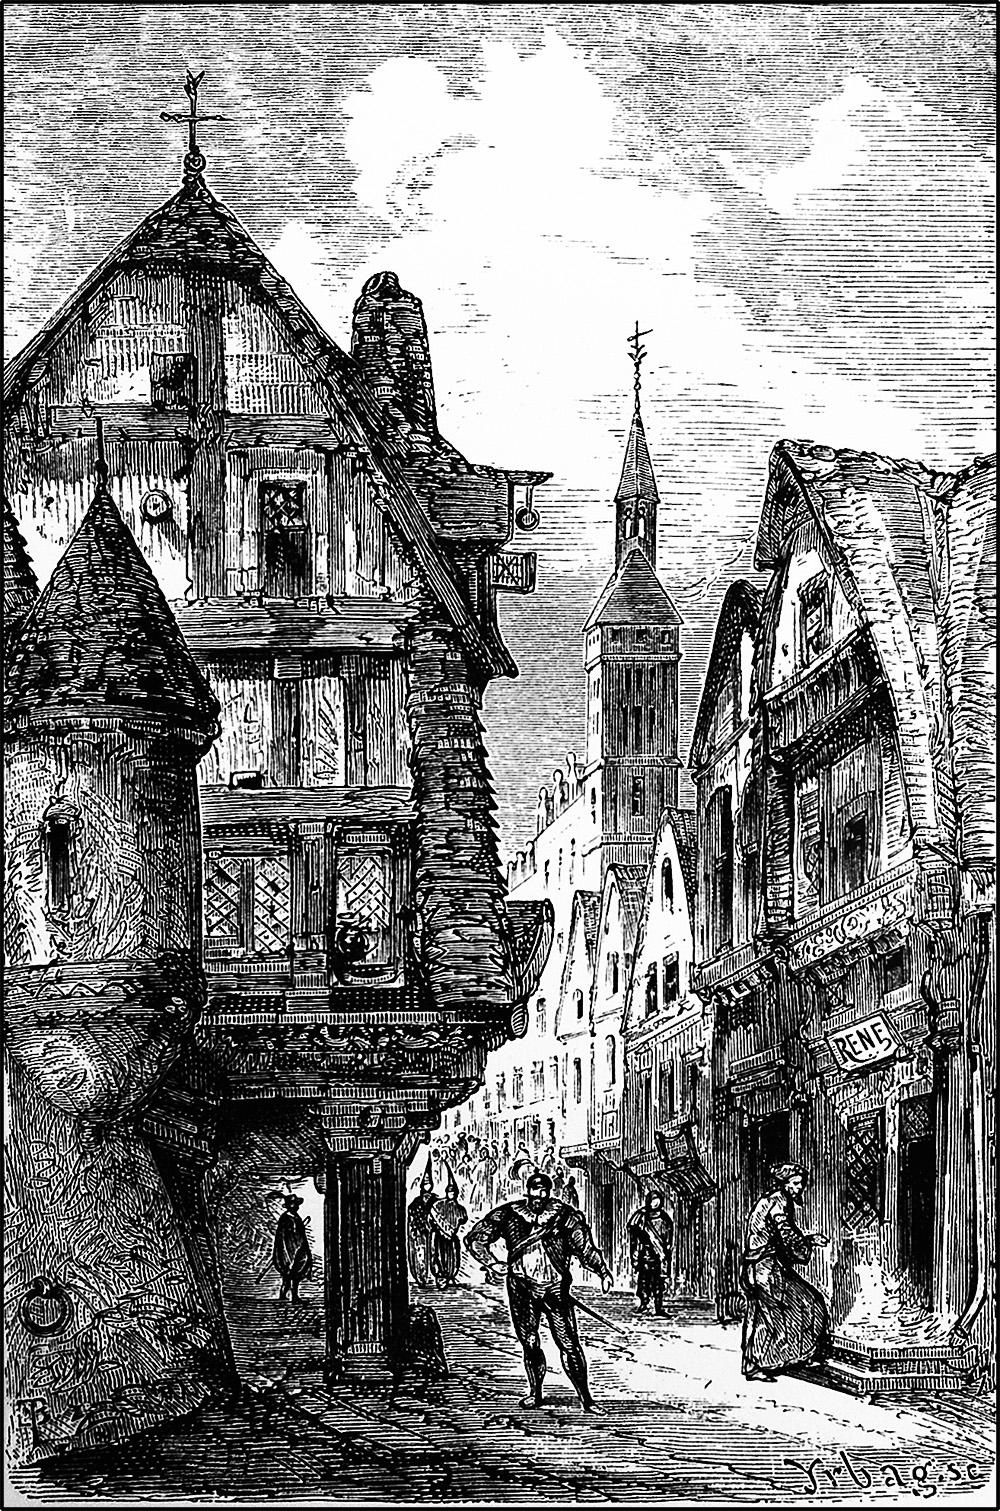 The shop of René Le Florentin — First perfumer of Paris